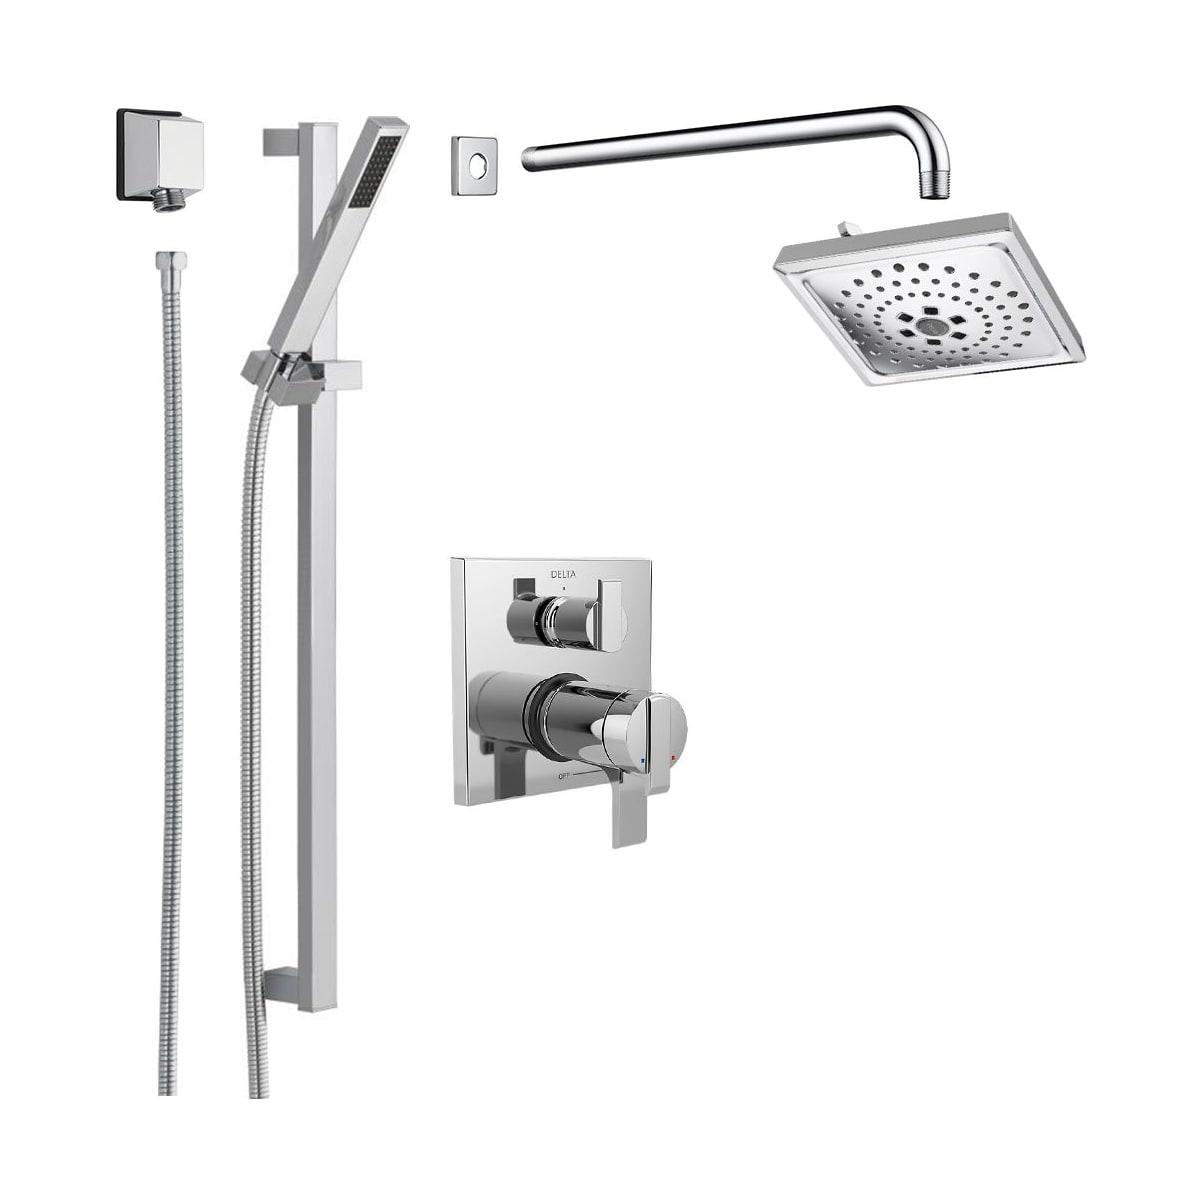 Delta Dss Ara 17t05 Chrome Ara Thermostatic Shower System With Shower Head Shower Arm Hand Shower Slide Bar Hose Valve Trim And Multichoice Rough In Faucet Com